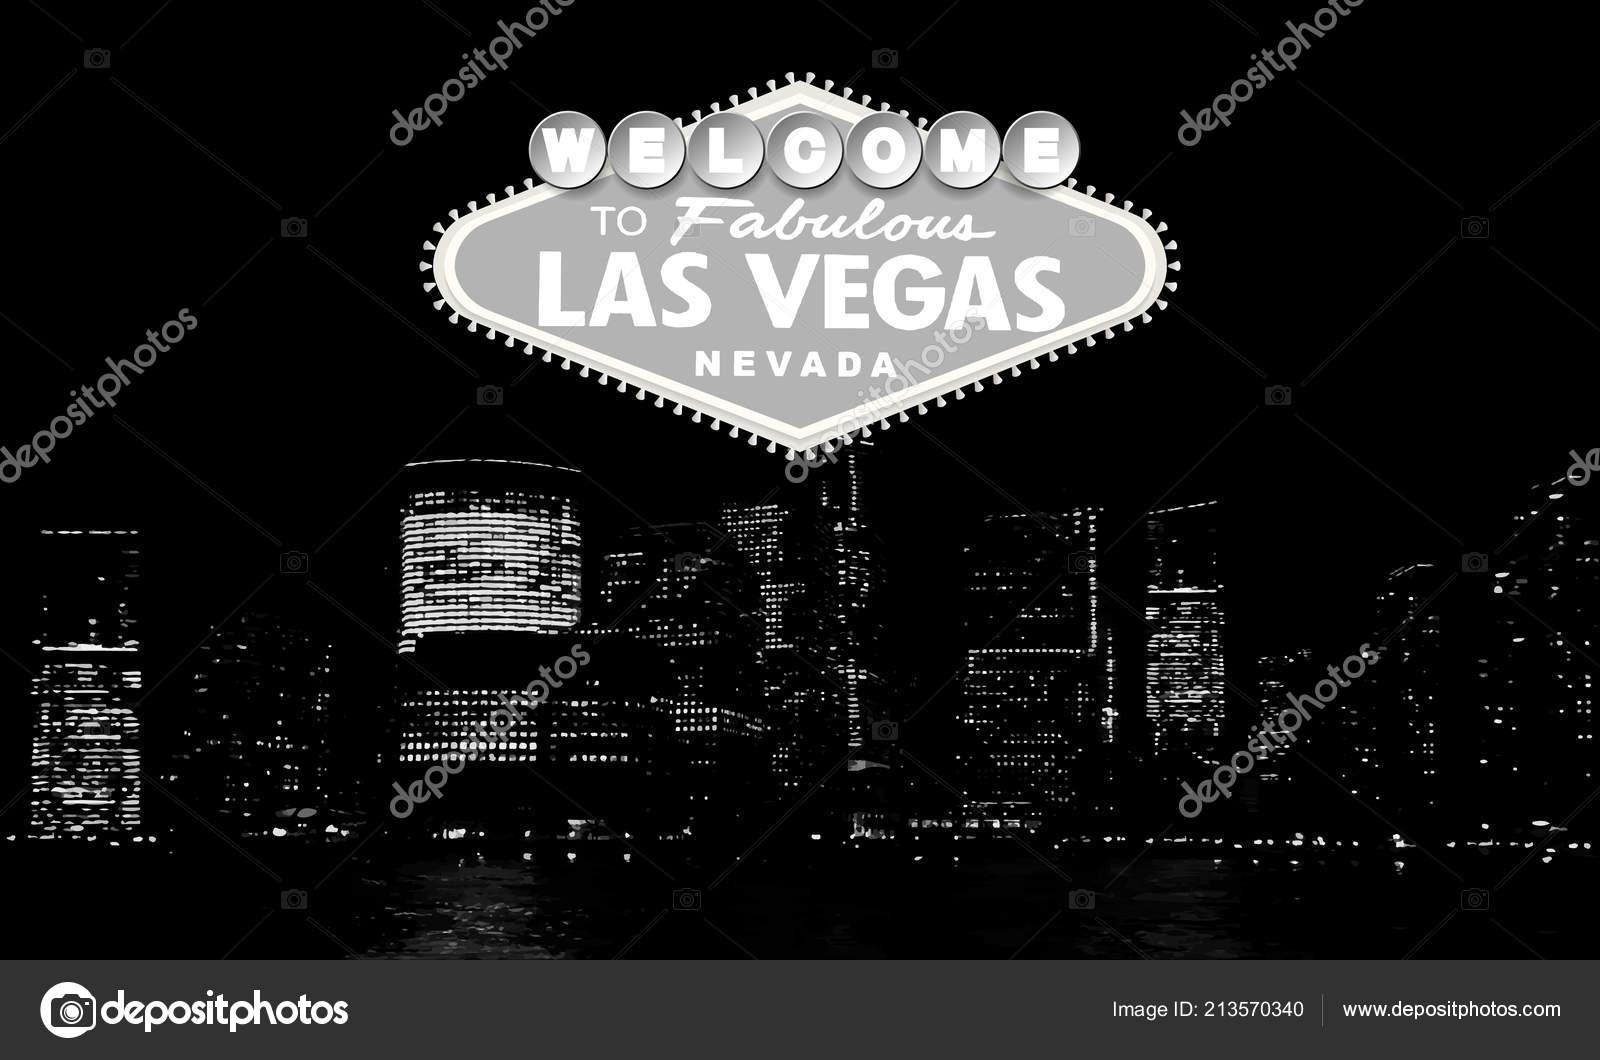 Welcome To Fabulous Las Vegas Nevada Classic Retro Welcome To Las